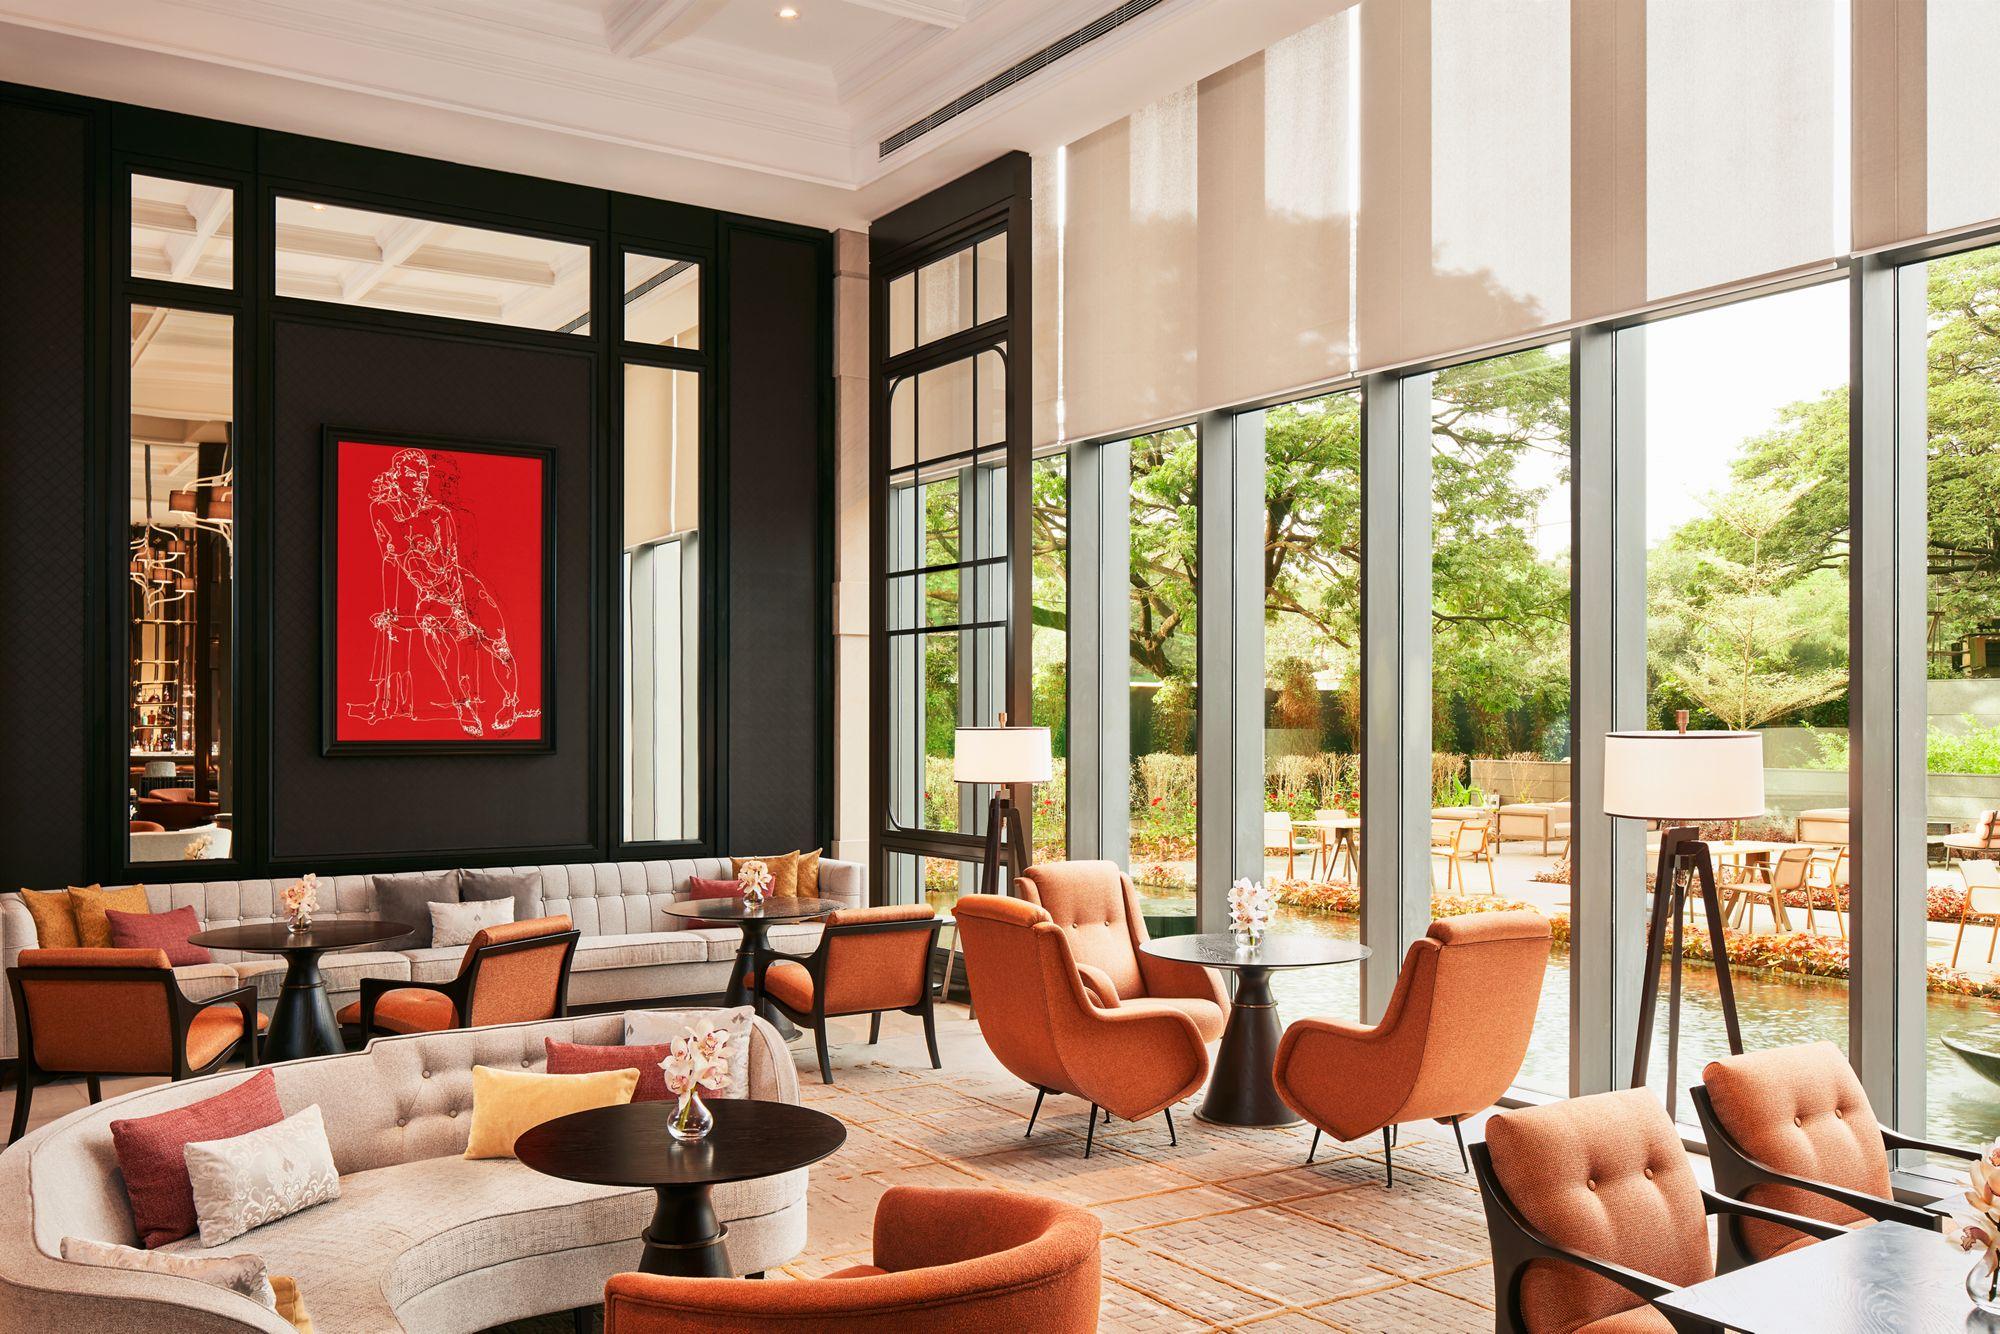 Three Kitchens Restaurant And Bar The Ritz Carlton Pune